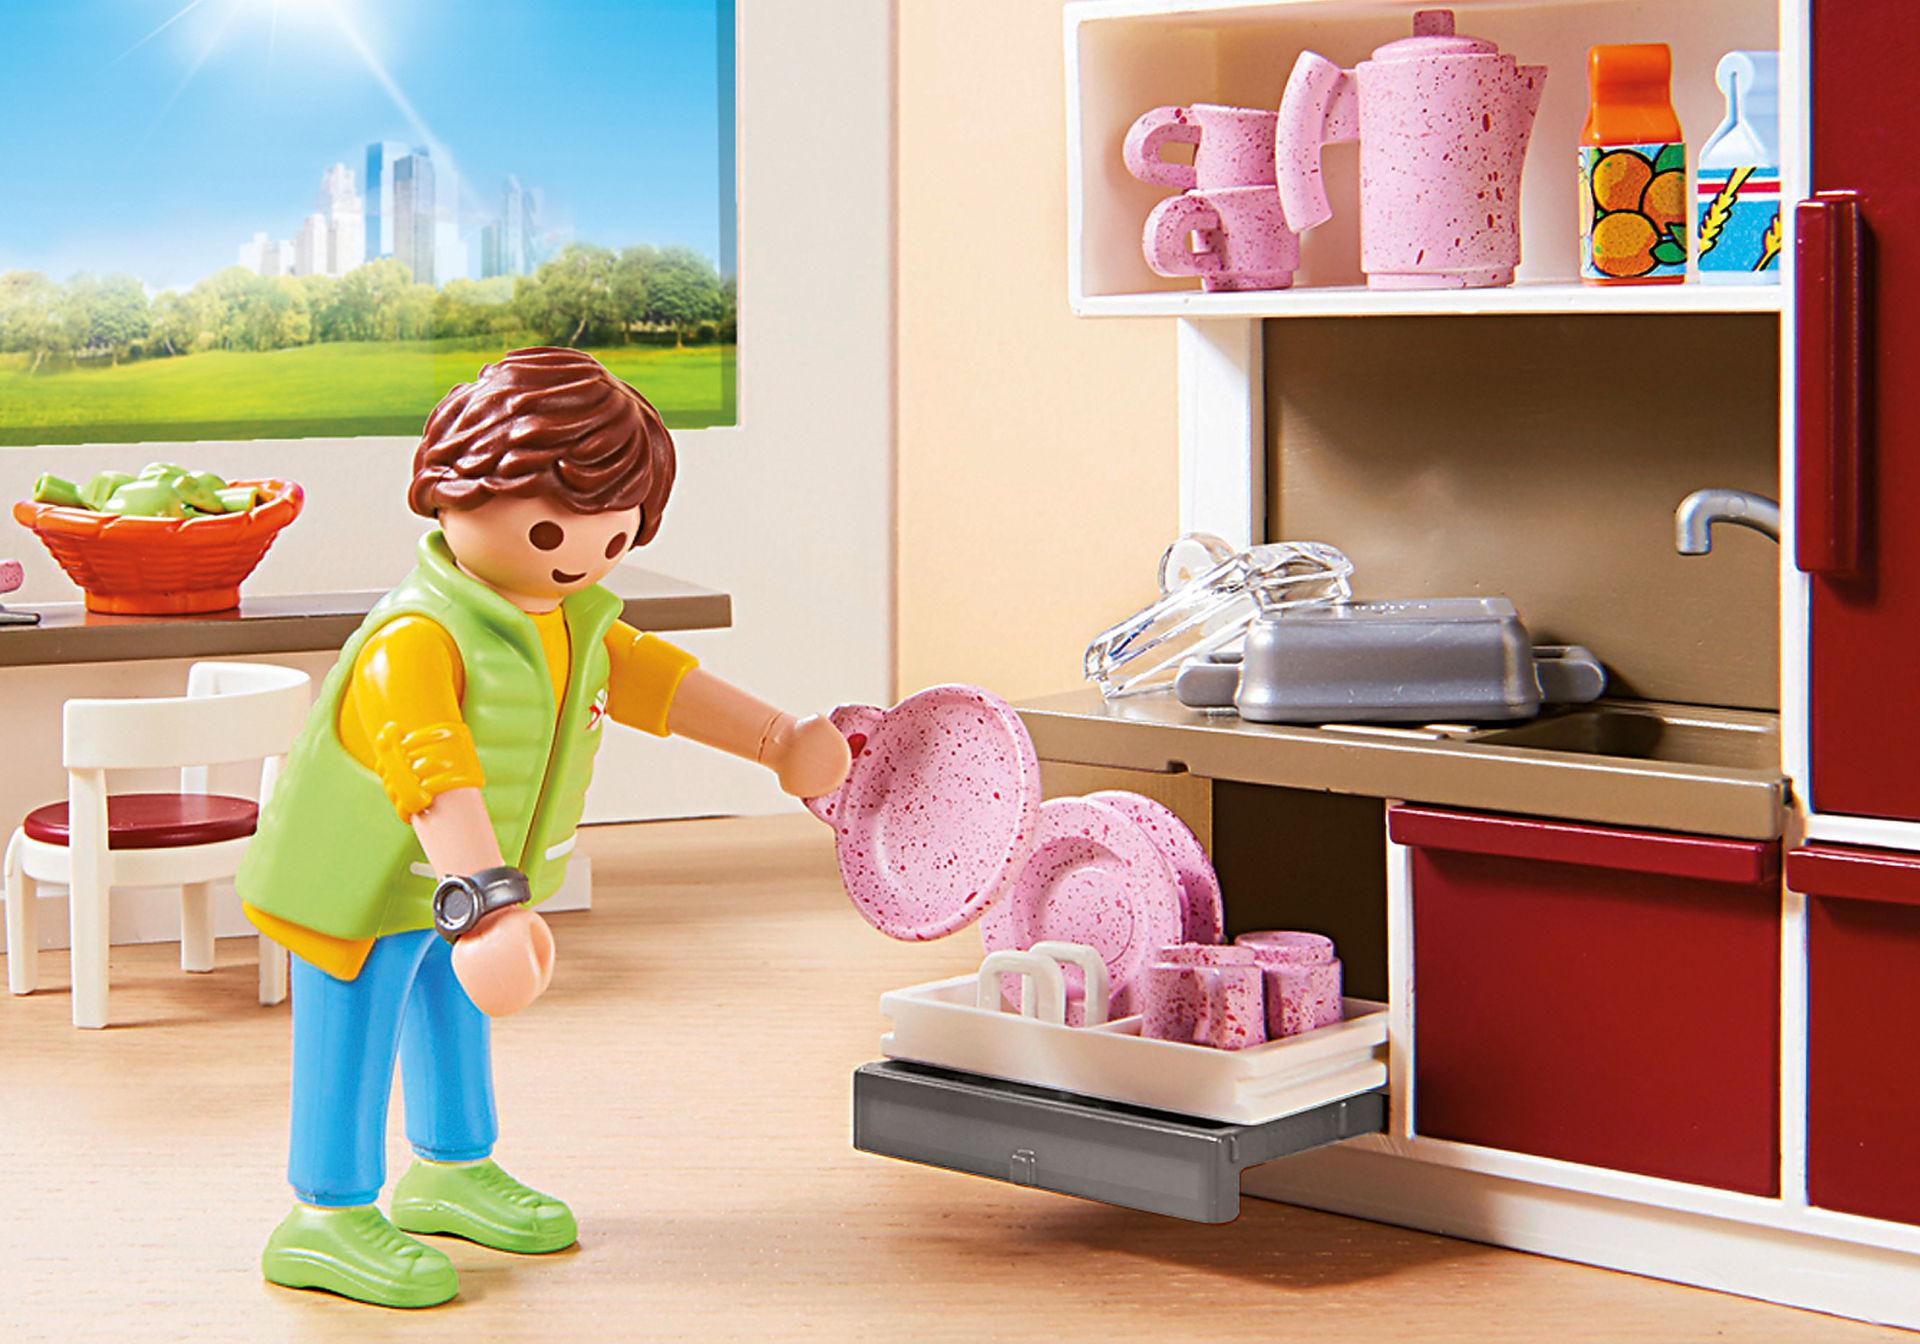 http://media.playmobil.com/i/playmobil/9269_product_extra2/Große Familienküche